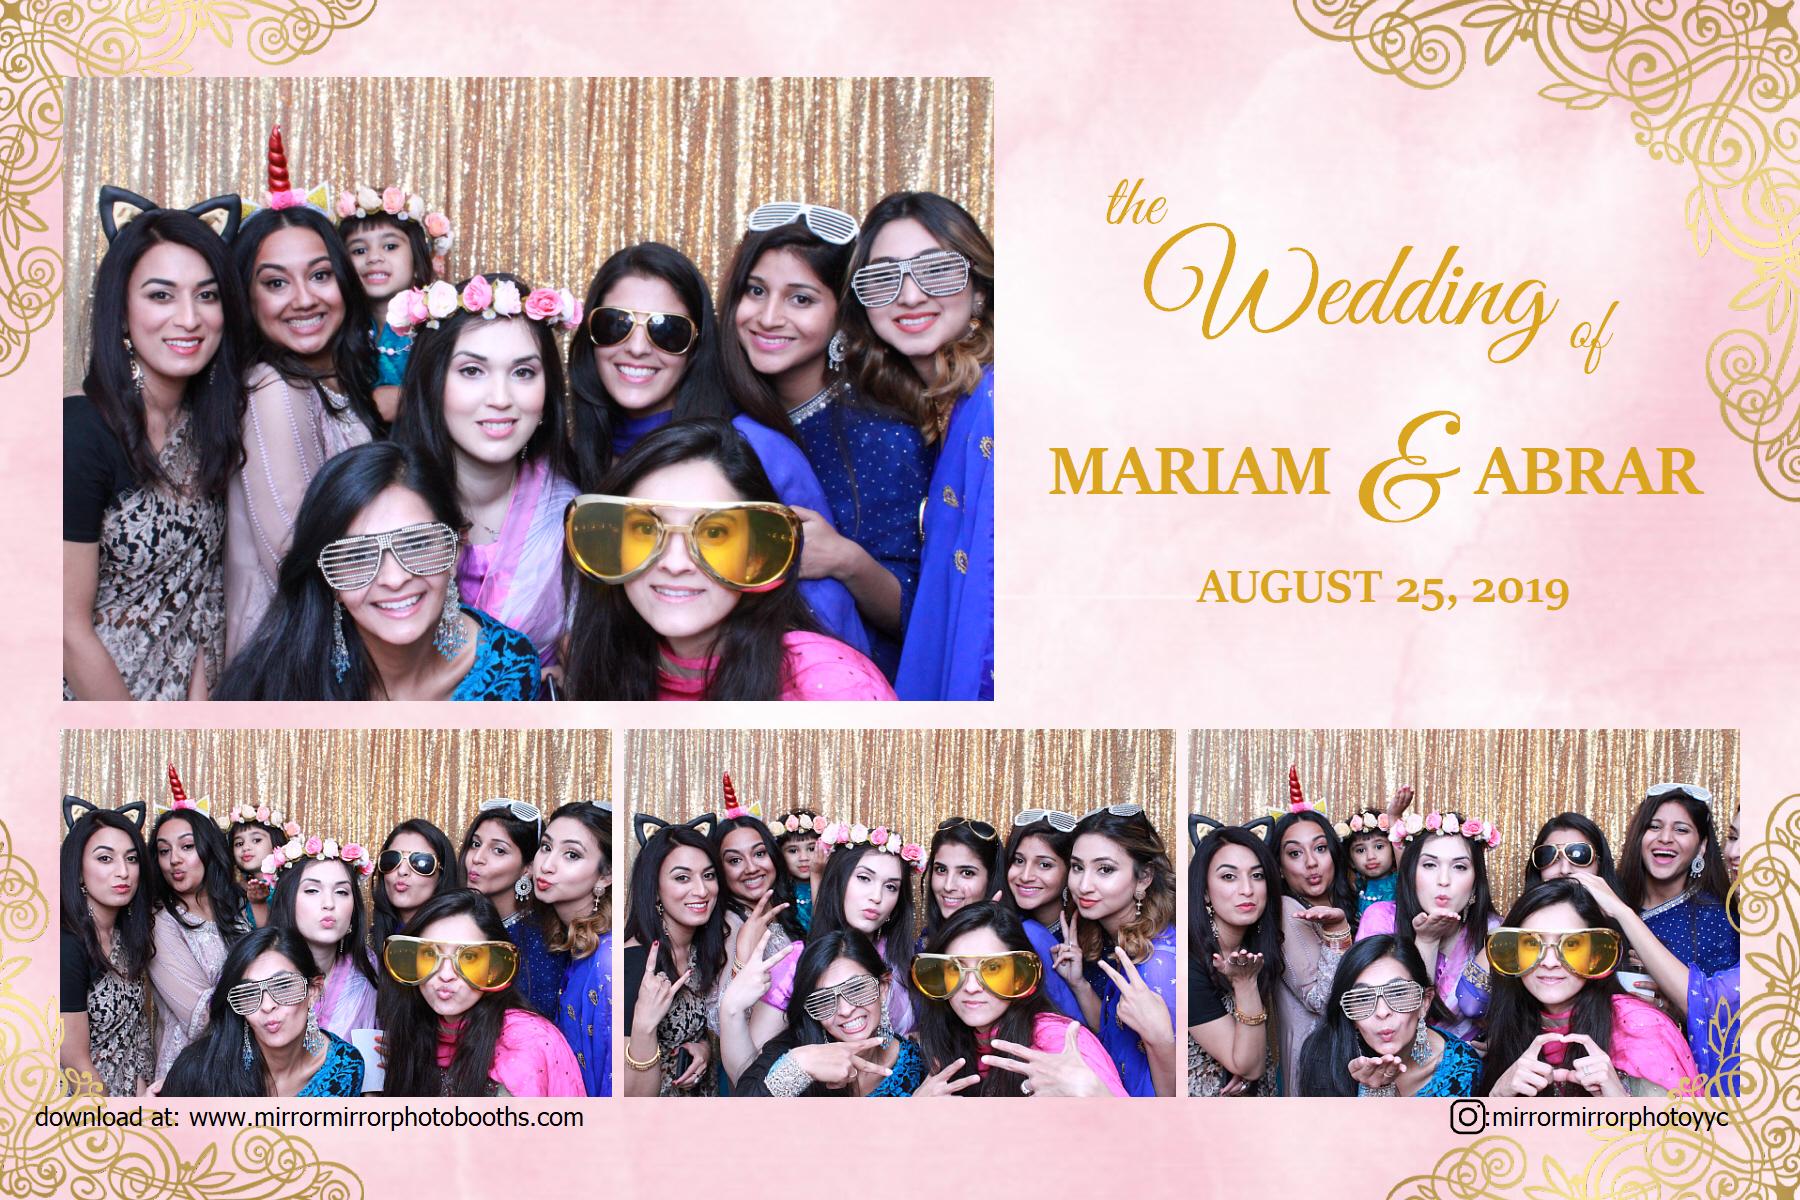 Mariam and Abrar's Wedding - Aug 25, 2019